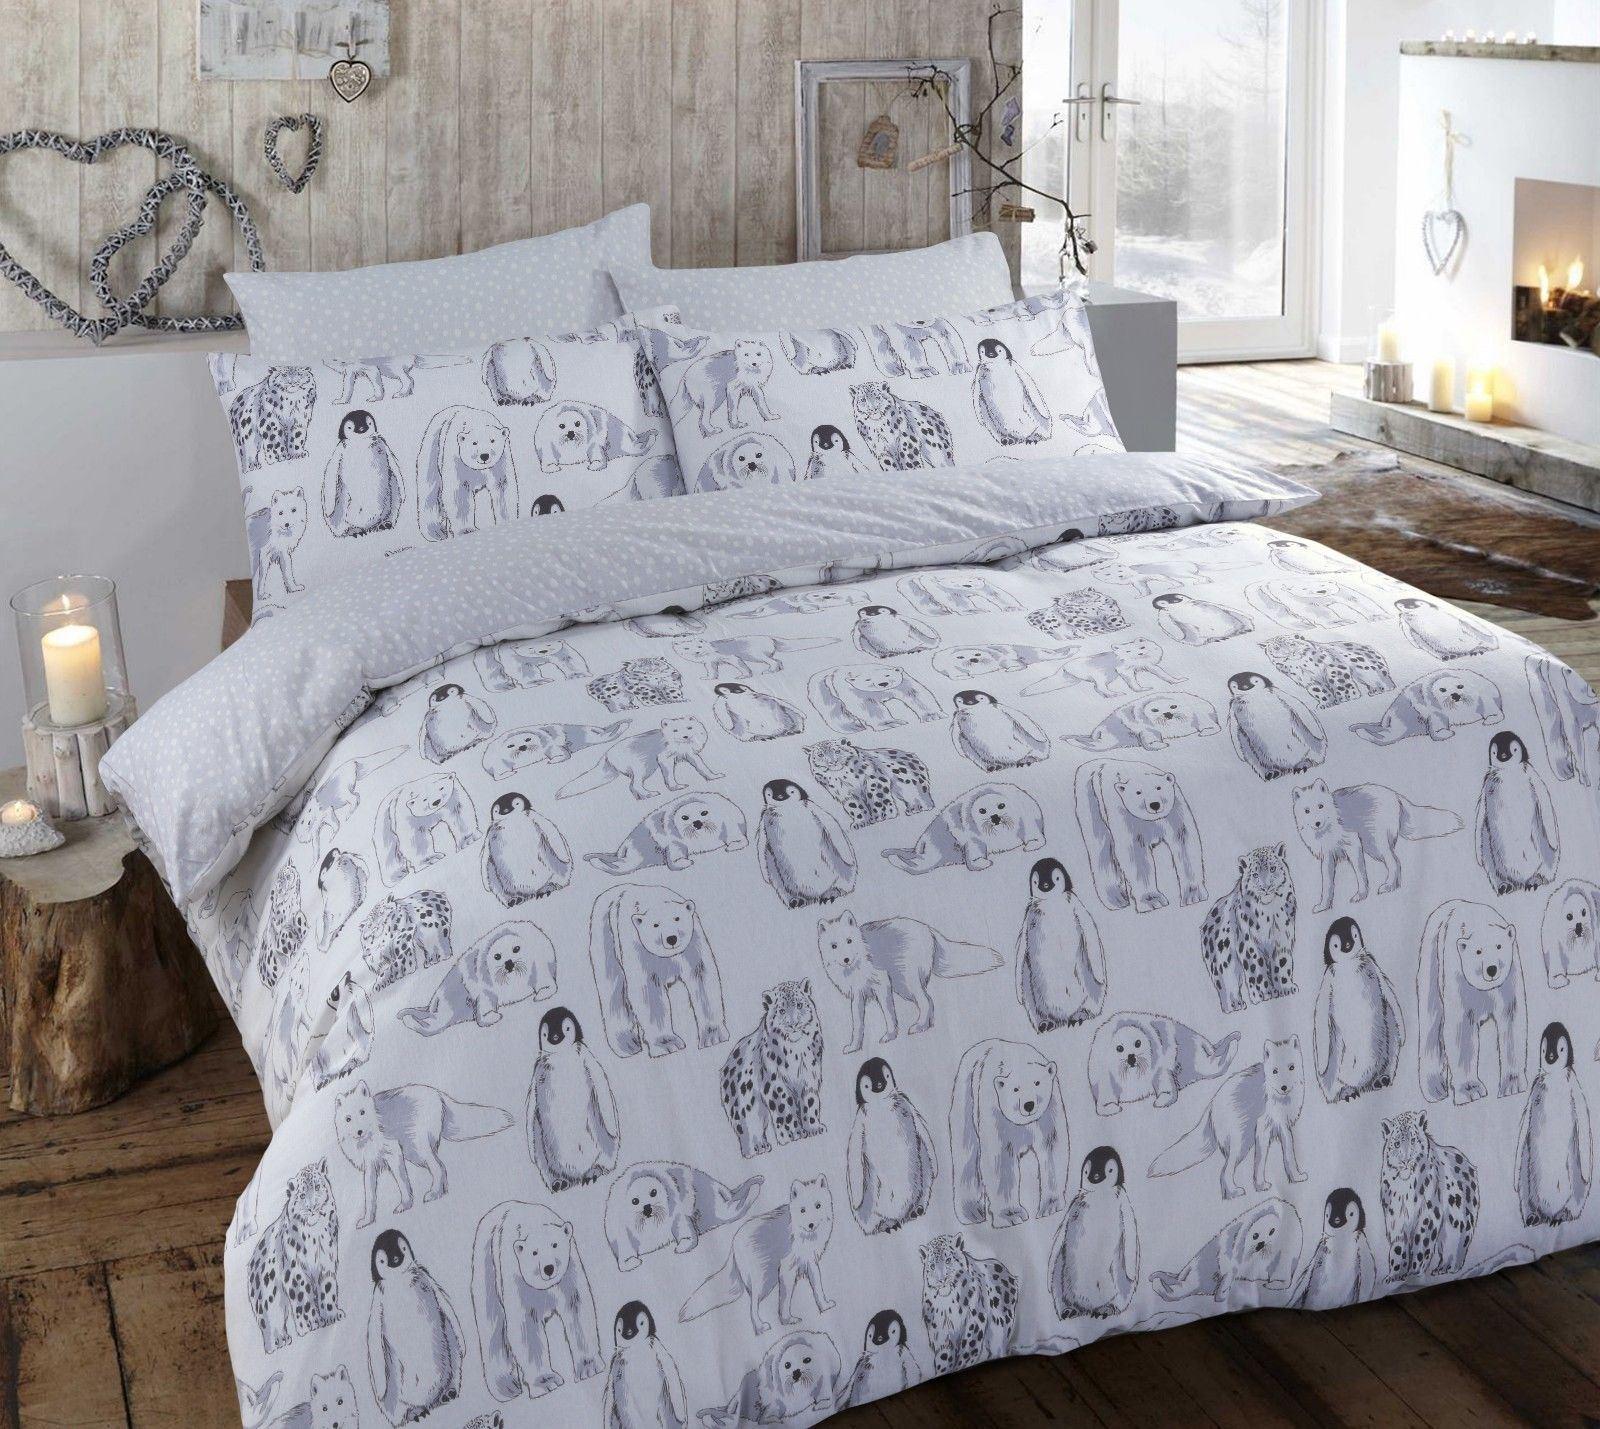 Cos E Un Copripiumino.Christmas Brushed Cotton Flannel Reversible Bed Quilt Set Duvet